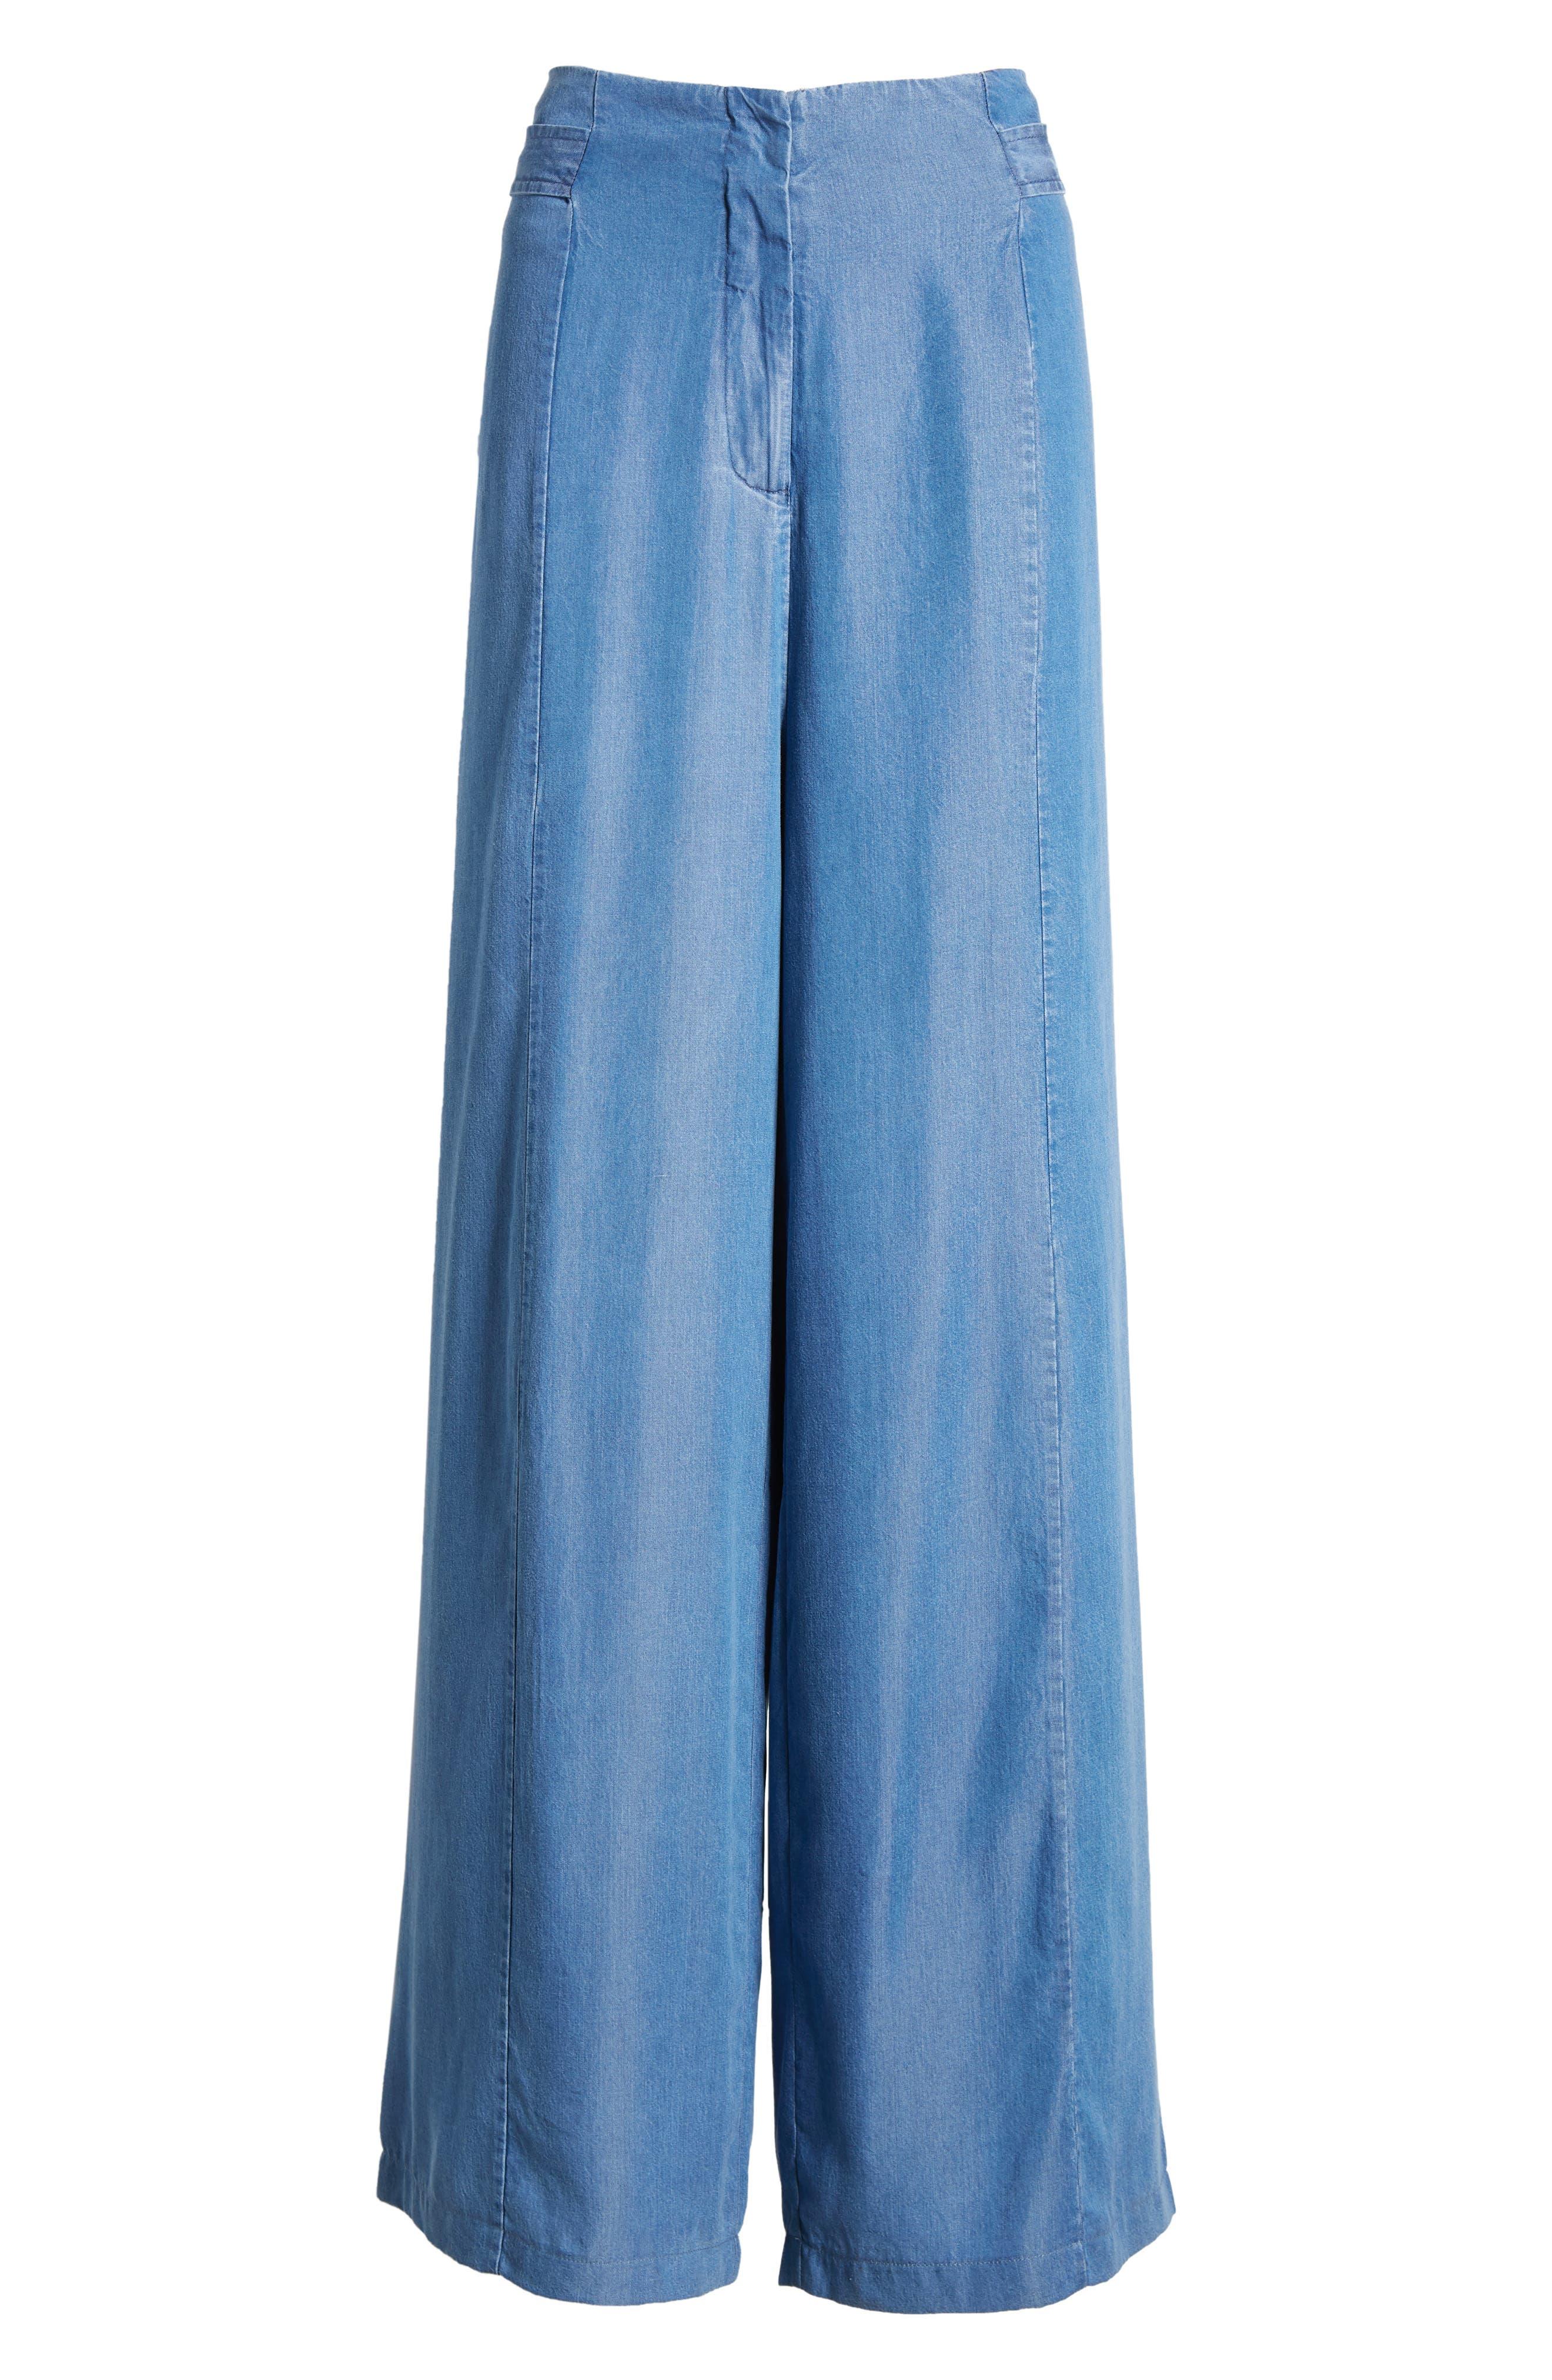 Bishop + Young O-Ring Wide Leg Denim Pants,                             Alternate thumbnail 7, color,                             CHAMBRAY